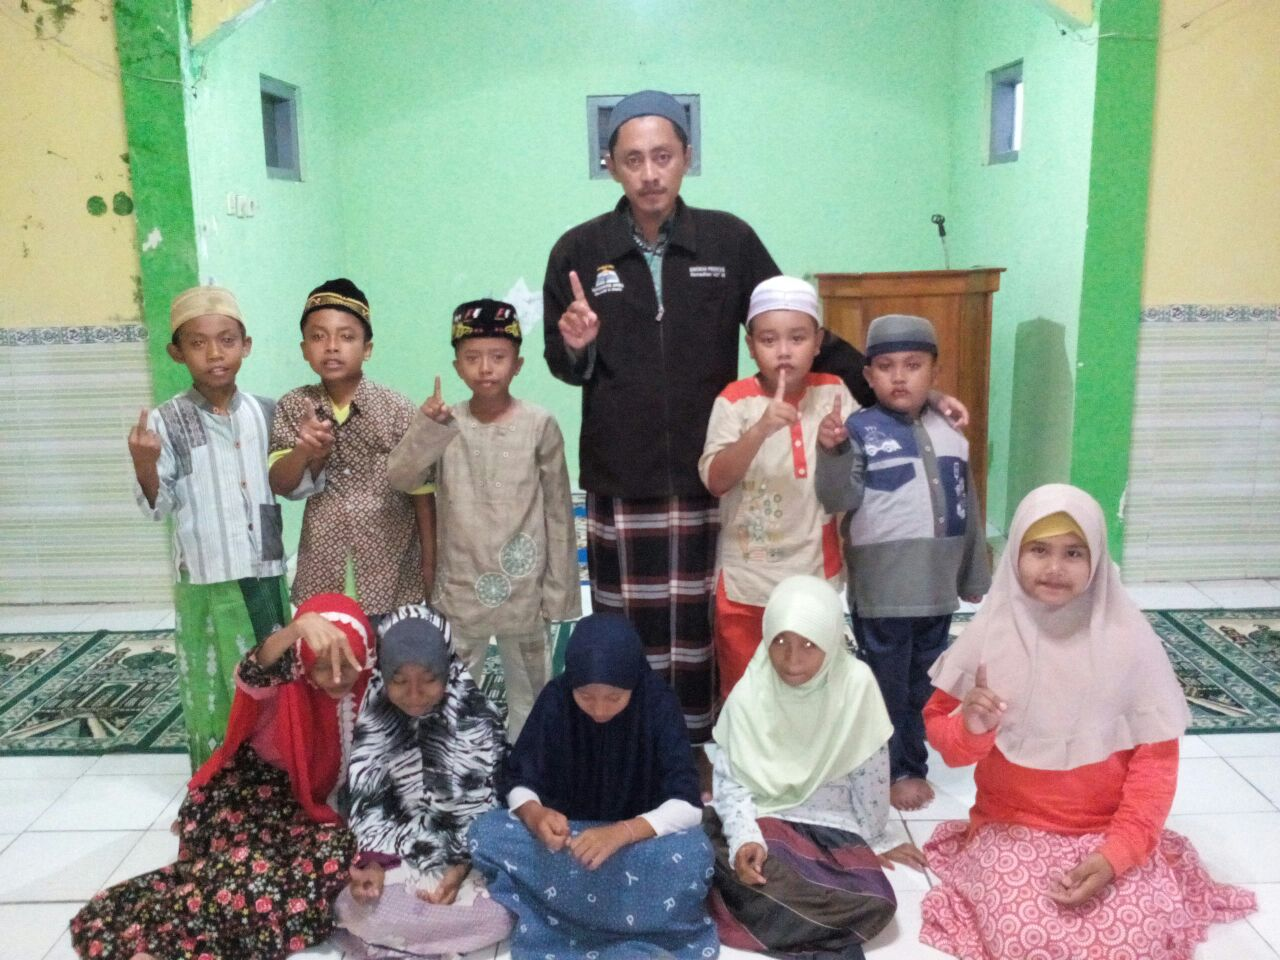 Semangat Tahfidz di Daerah Rawan Pemurtadan